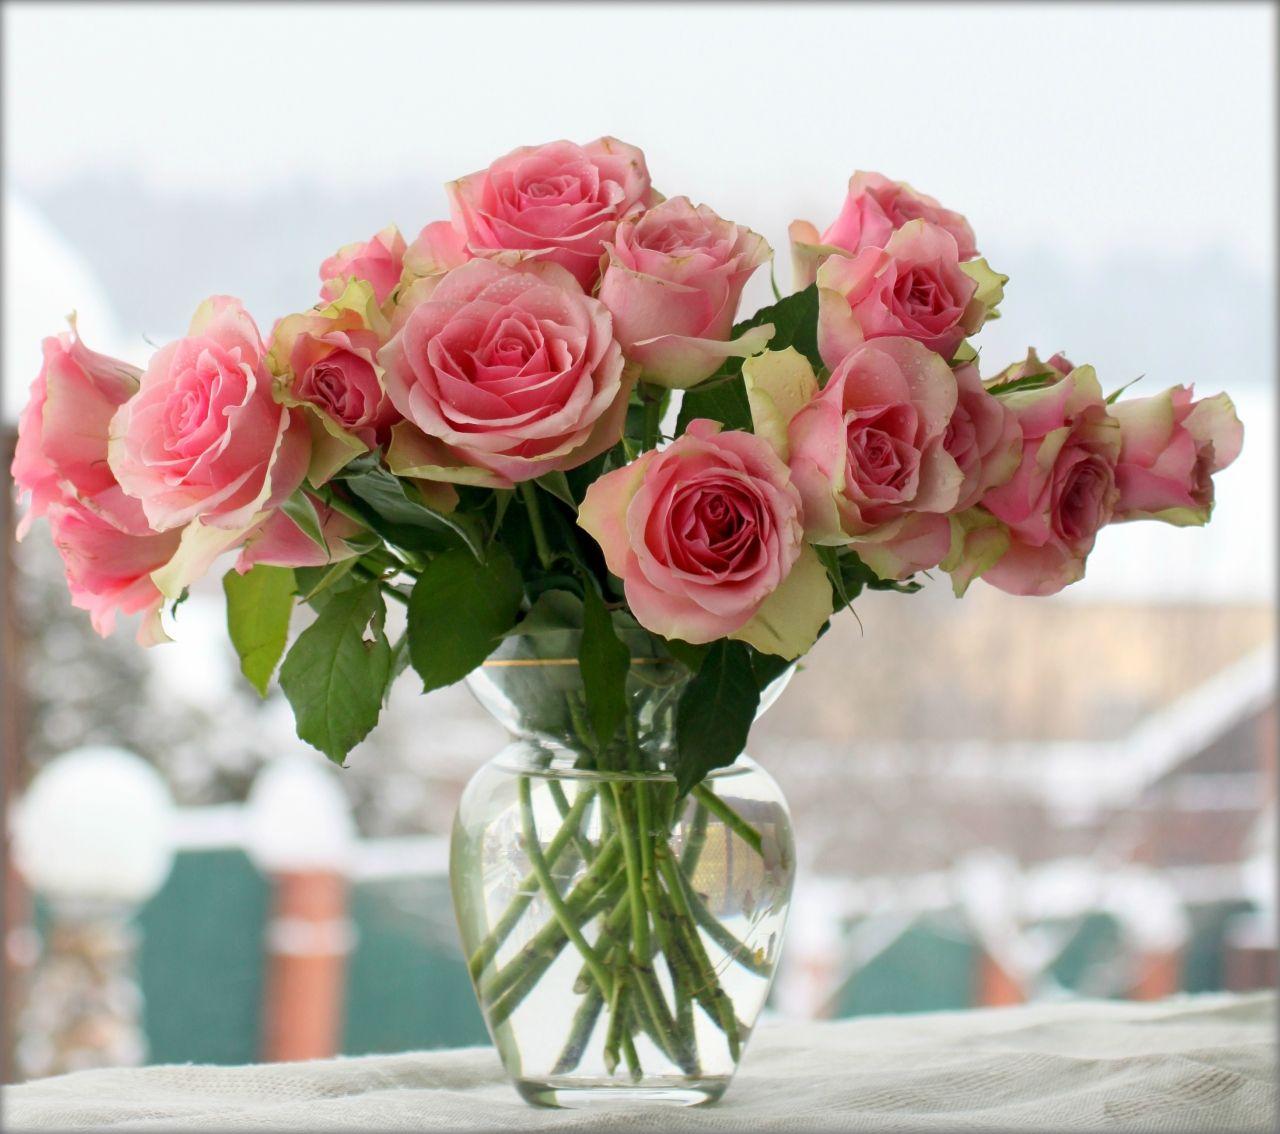 картинки розы в азе певец замедлил